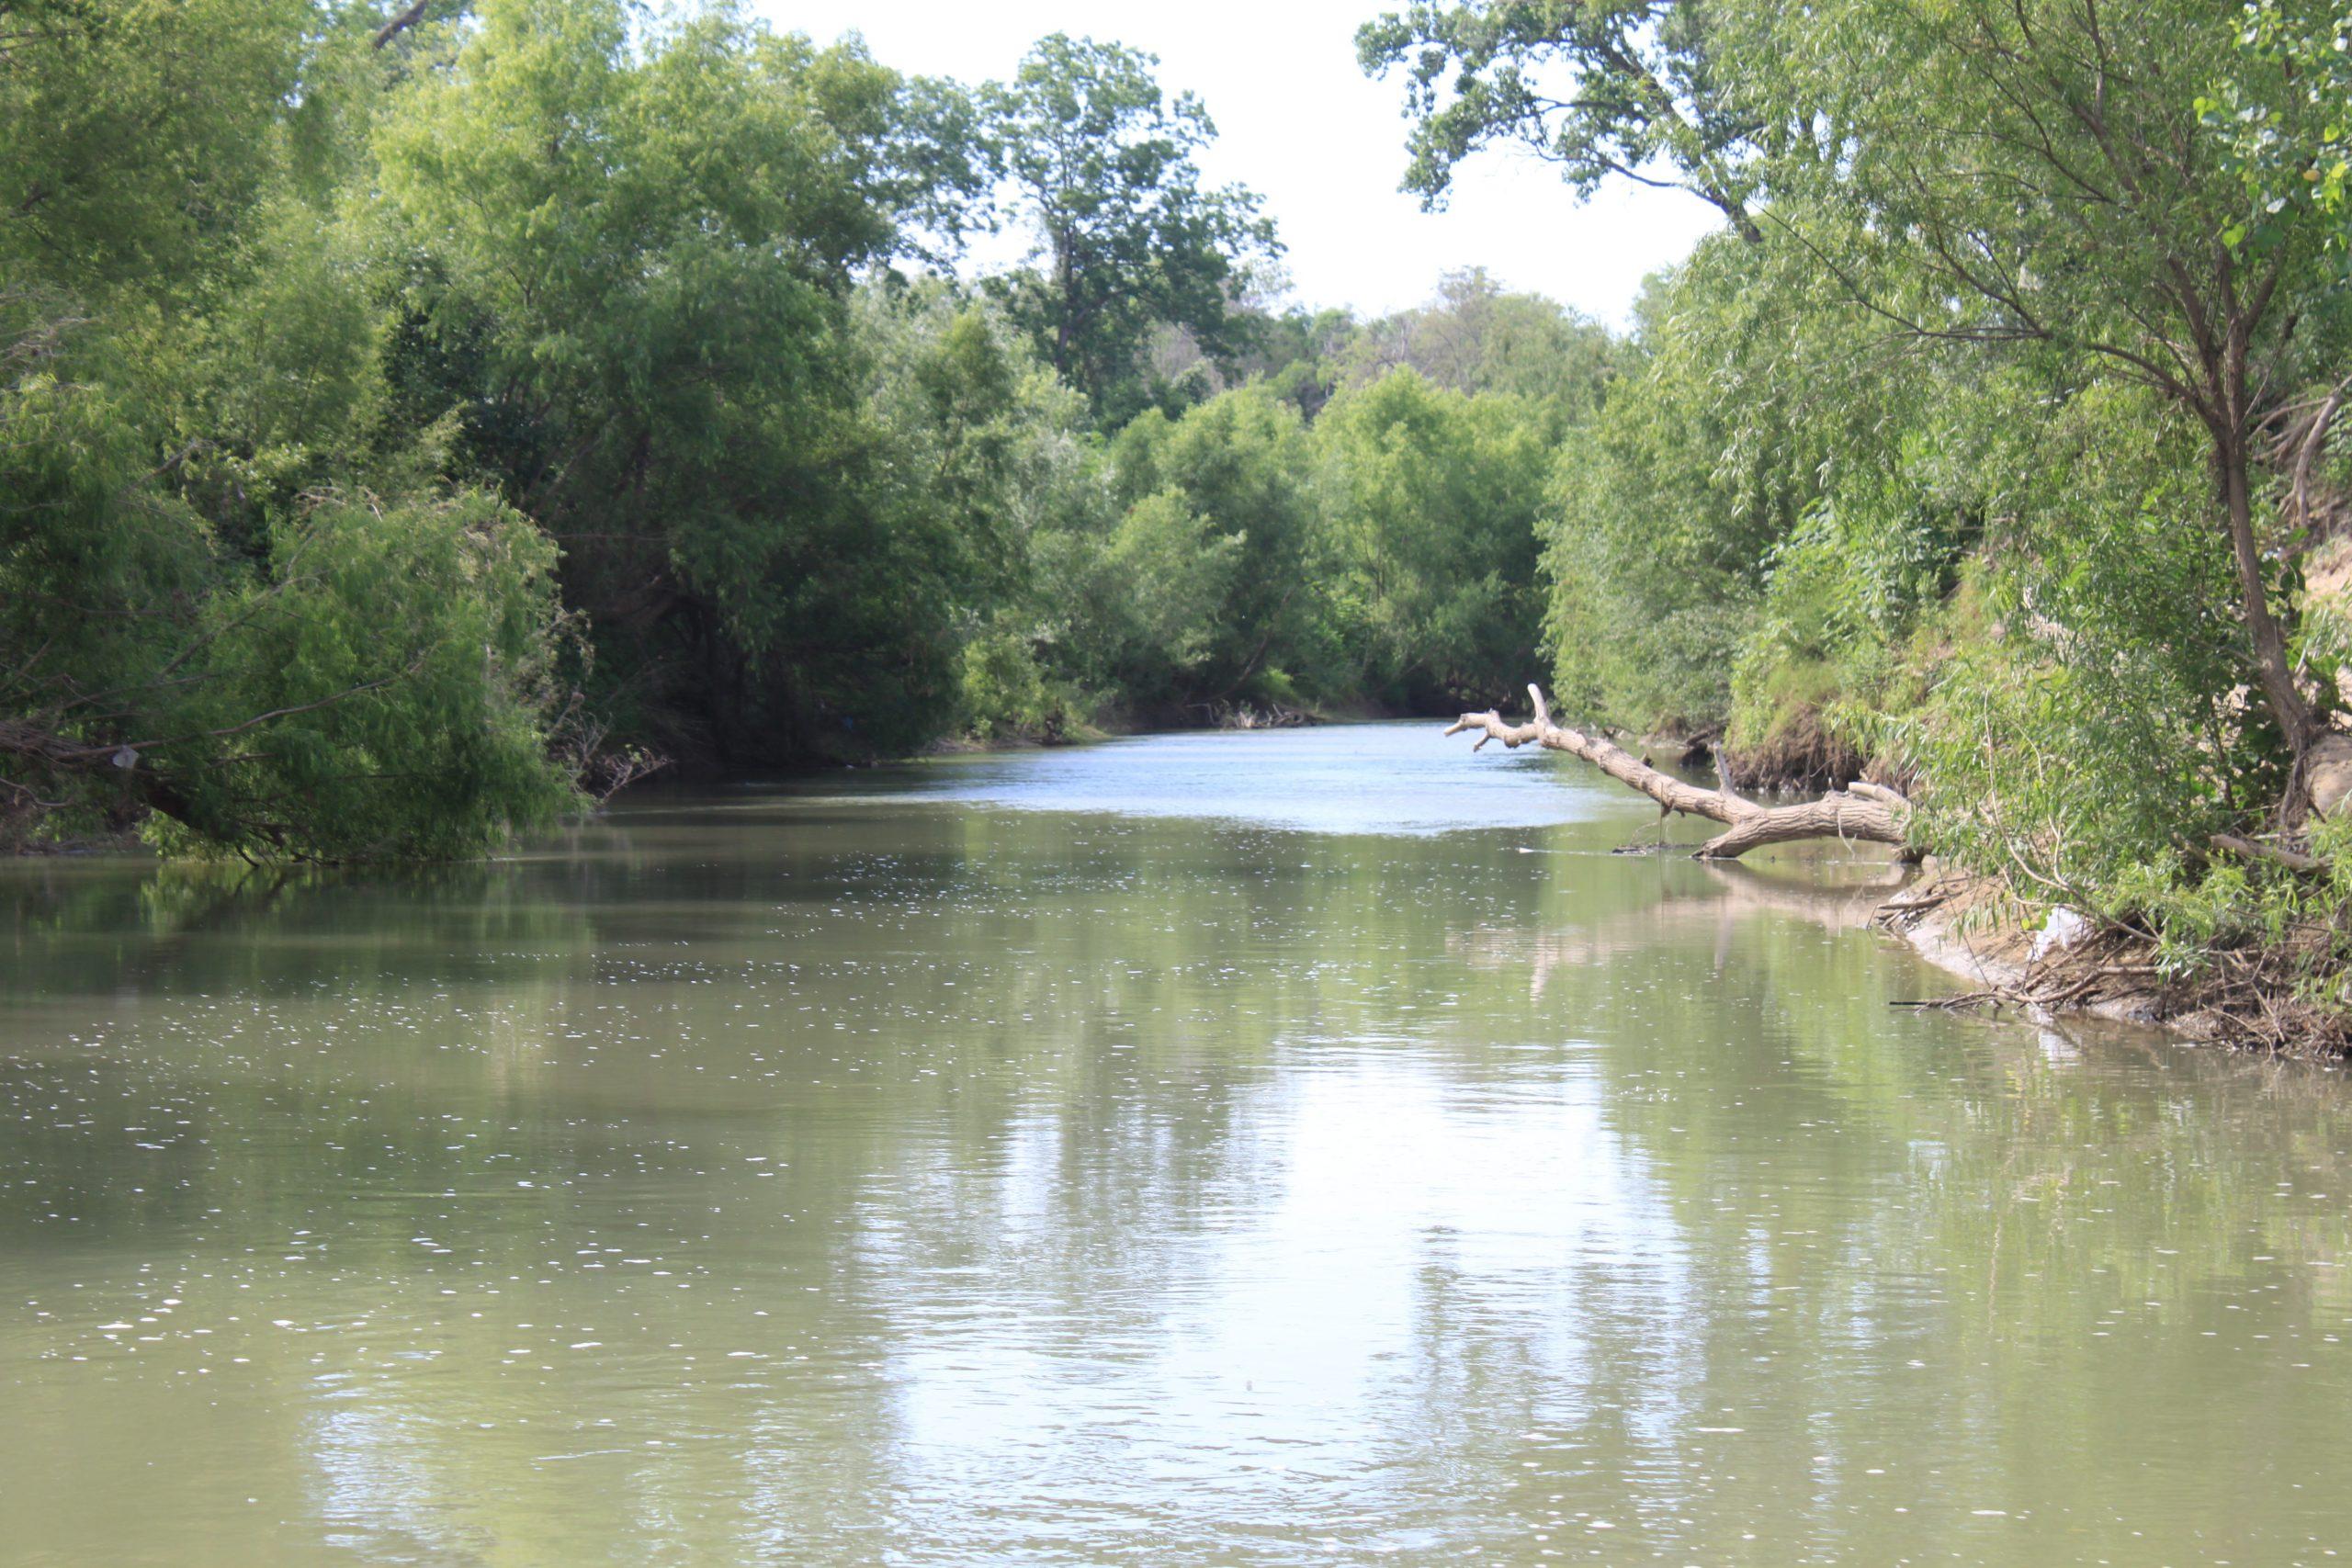 San Antonio River Saspamco Paddling Trail near CR 125 in Wilson County